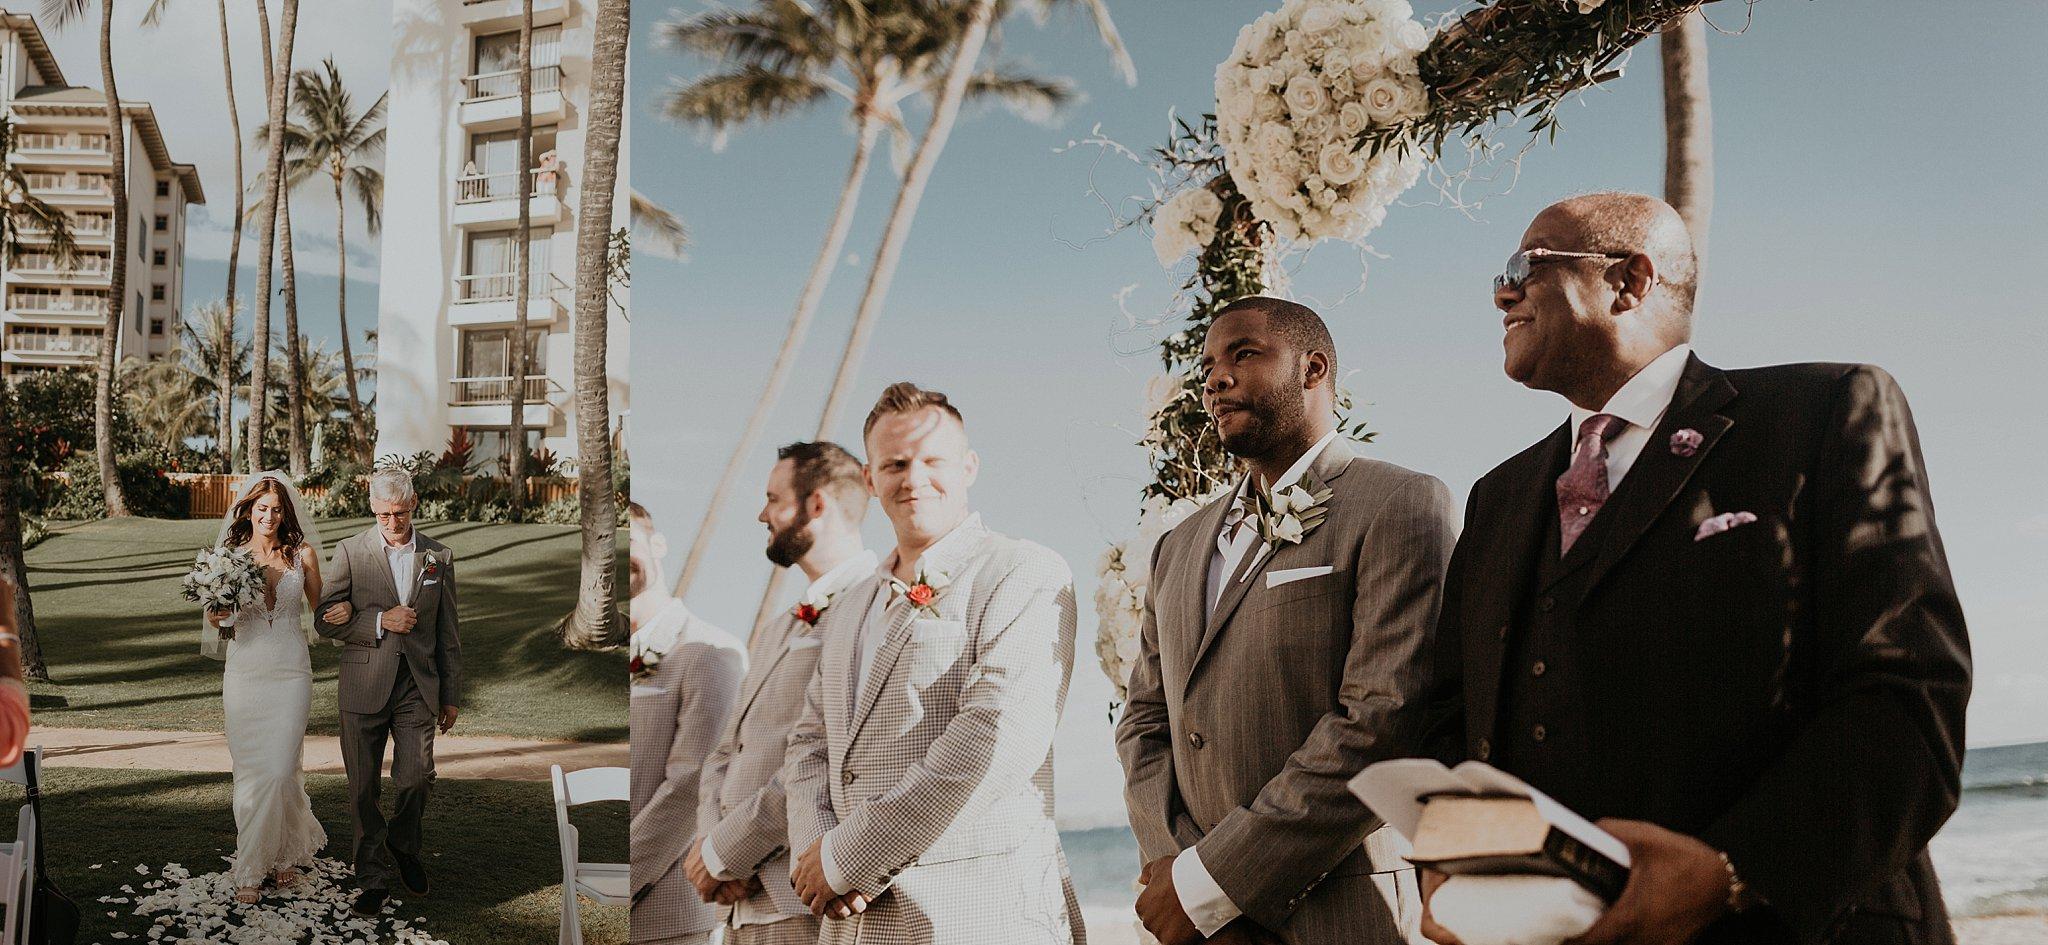 samantha_mcfarlen_bellingham_washington_engagement_photography_seattle_wedding_photographer_0200.jpg